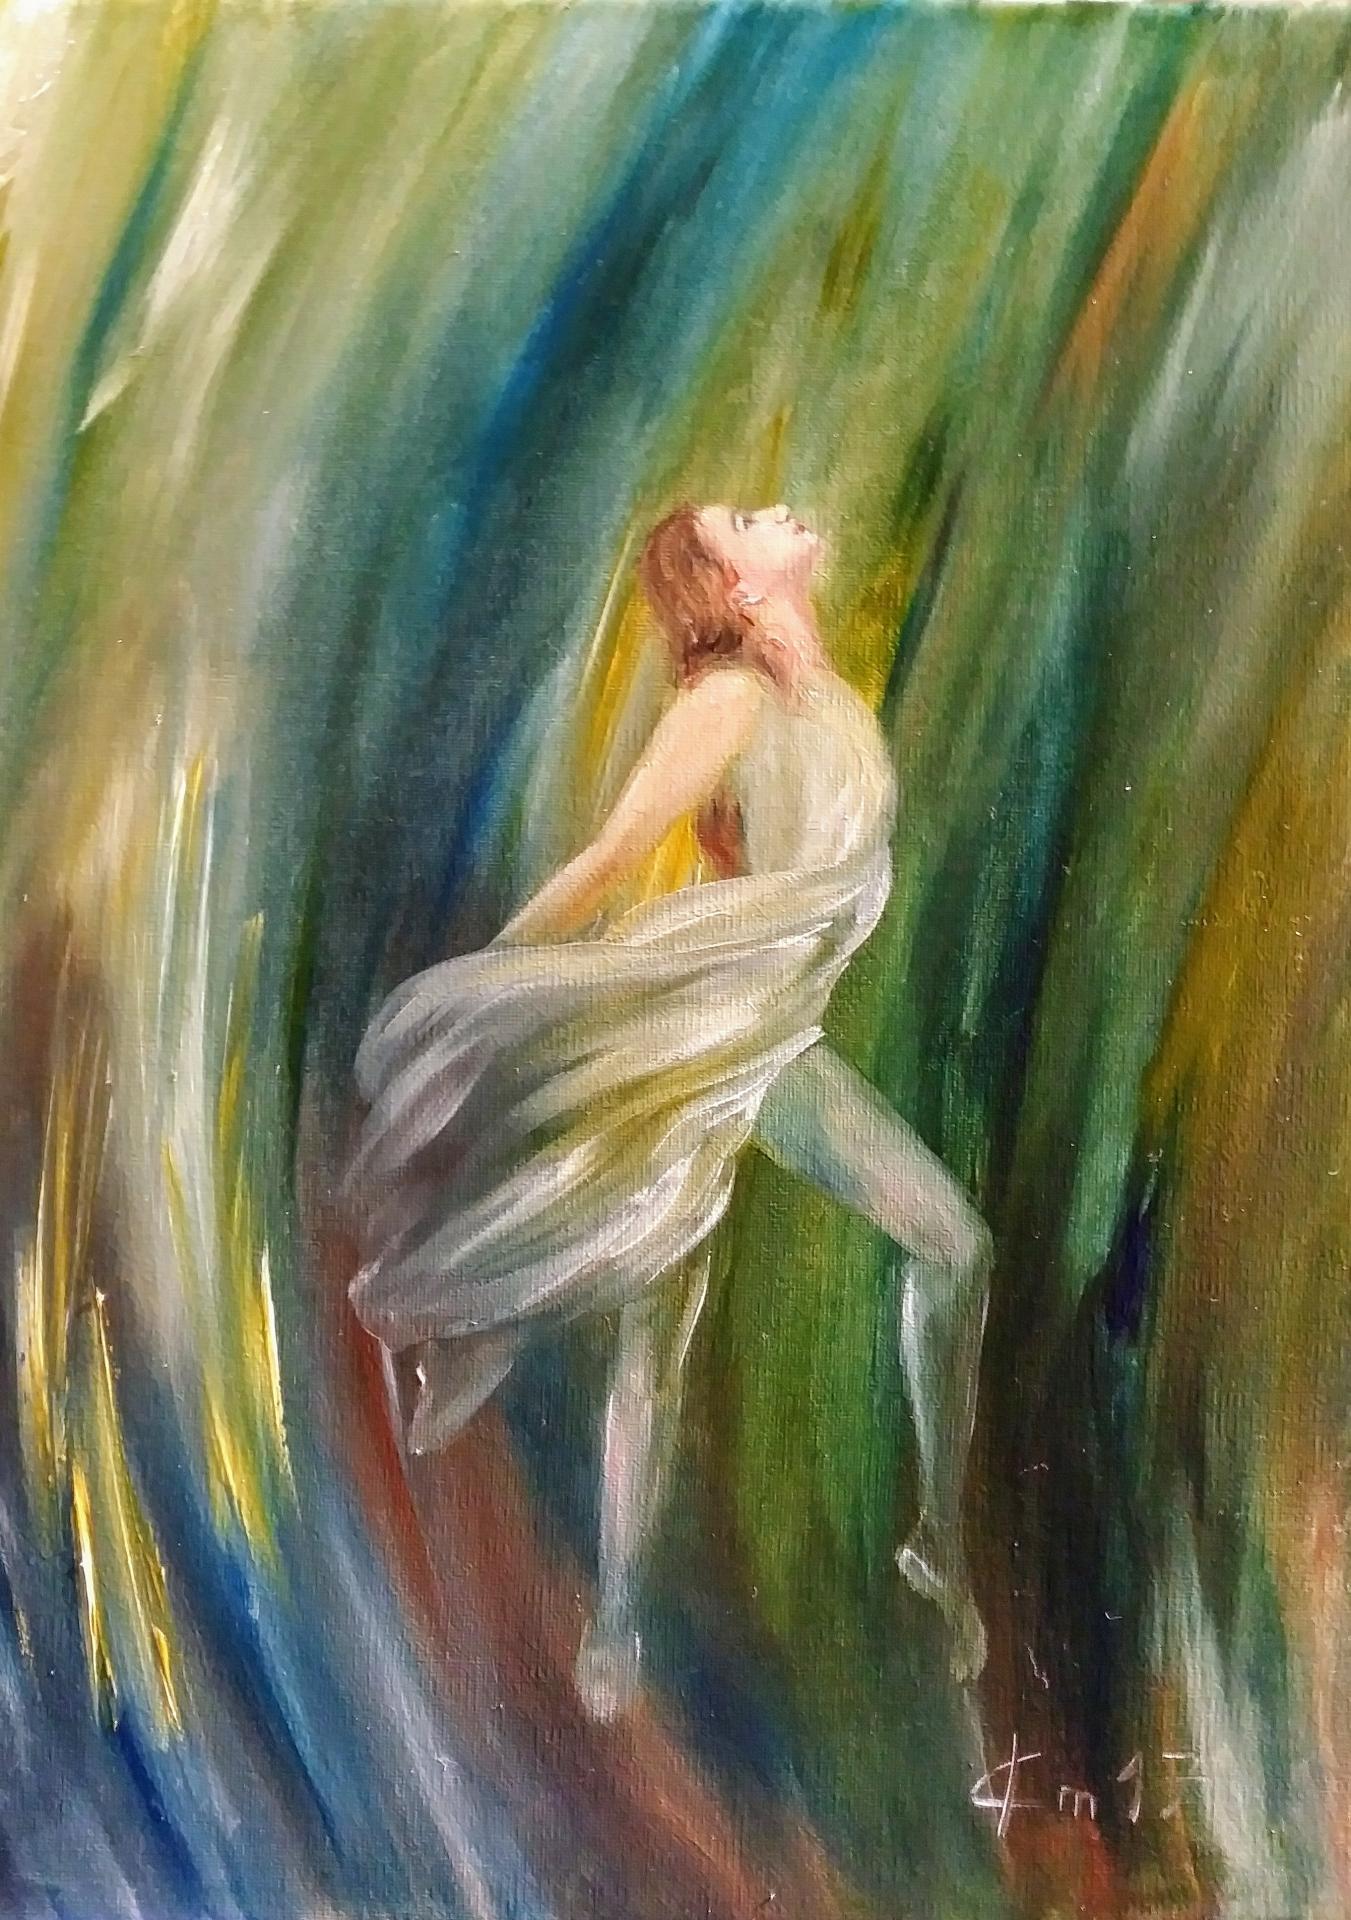 Danseuse peinture de jean joseph chevalier